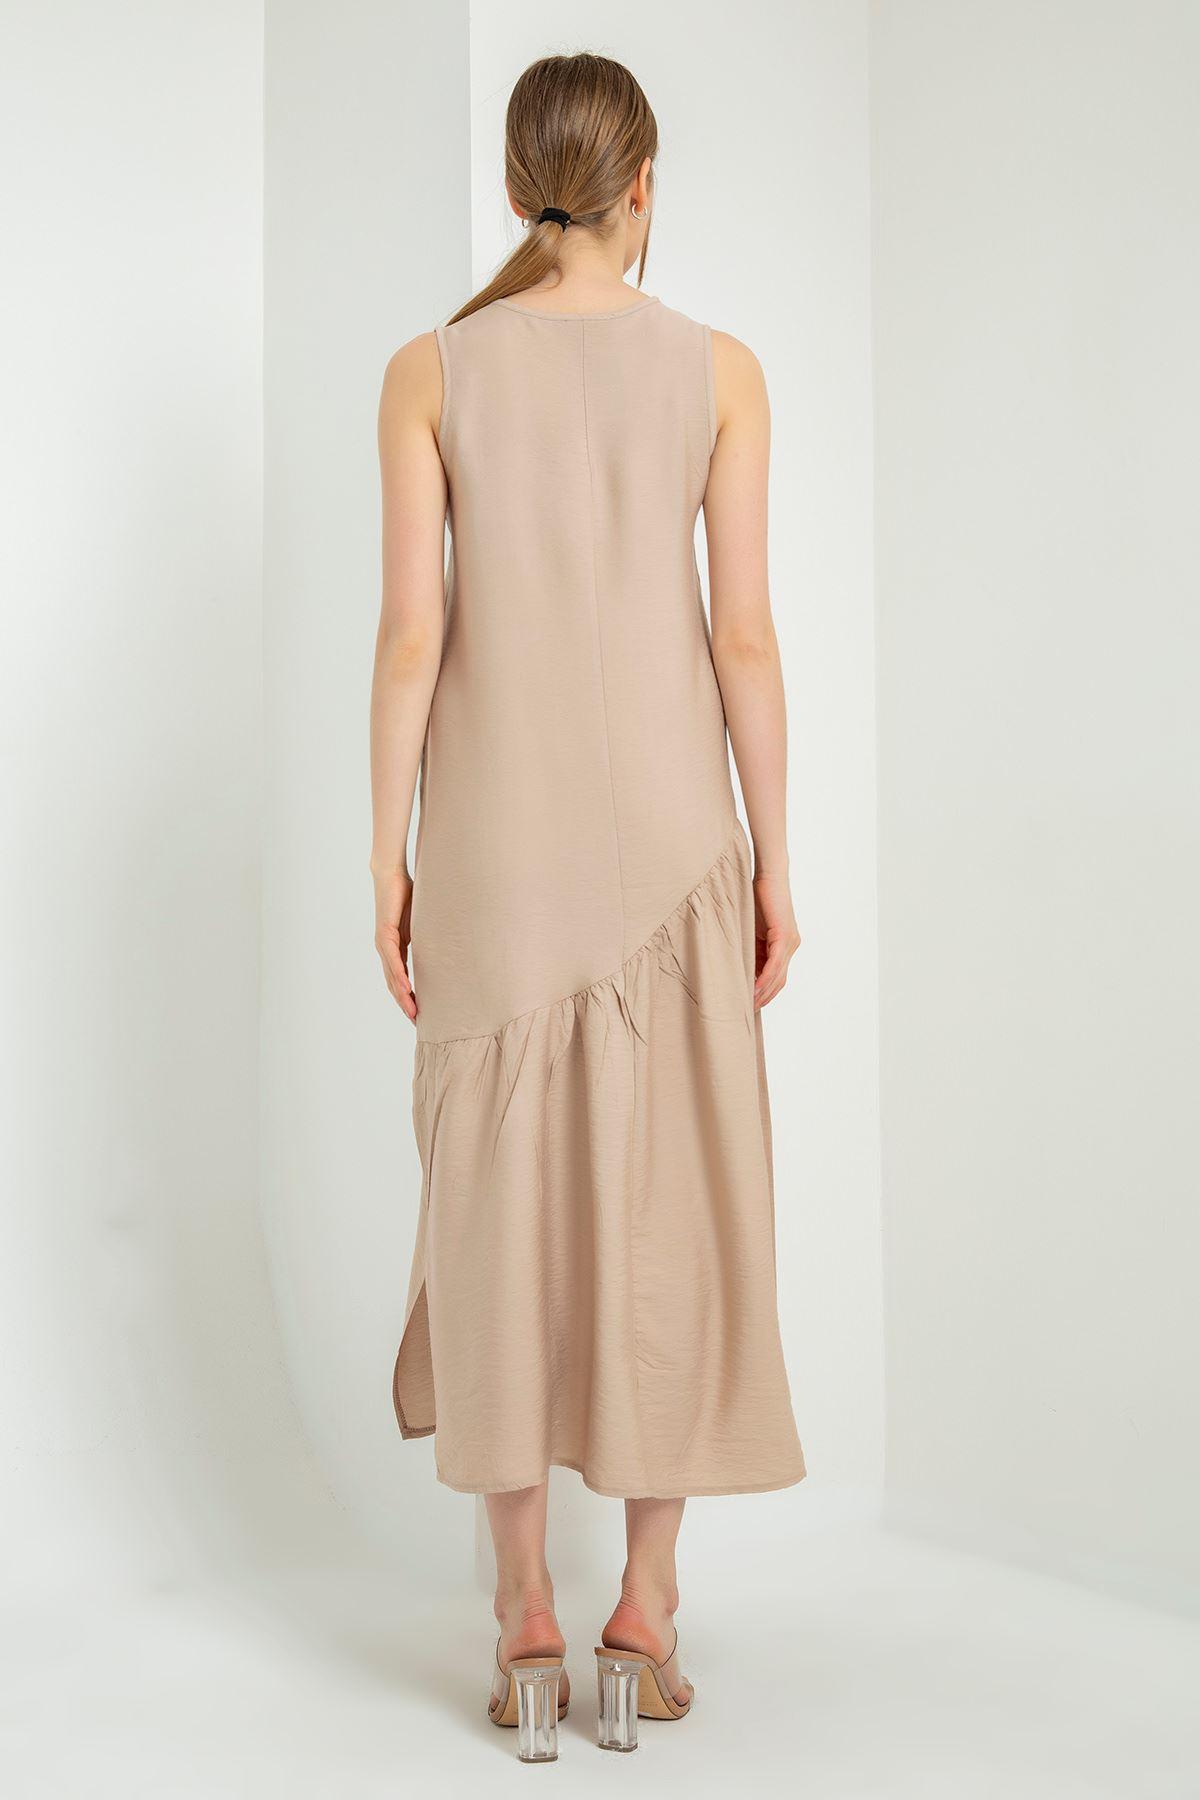 Sıfır Kol Salaş Elbise-Taş